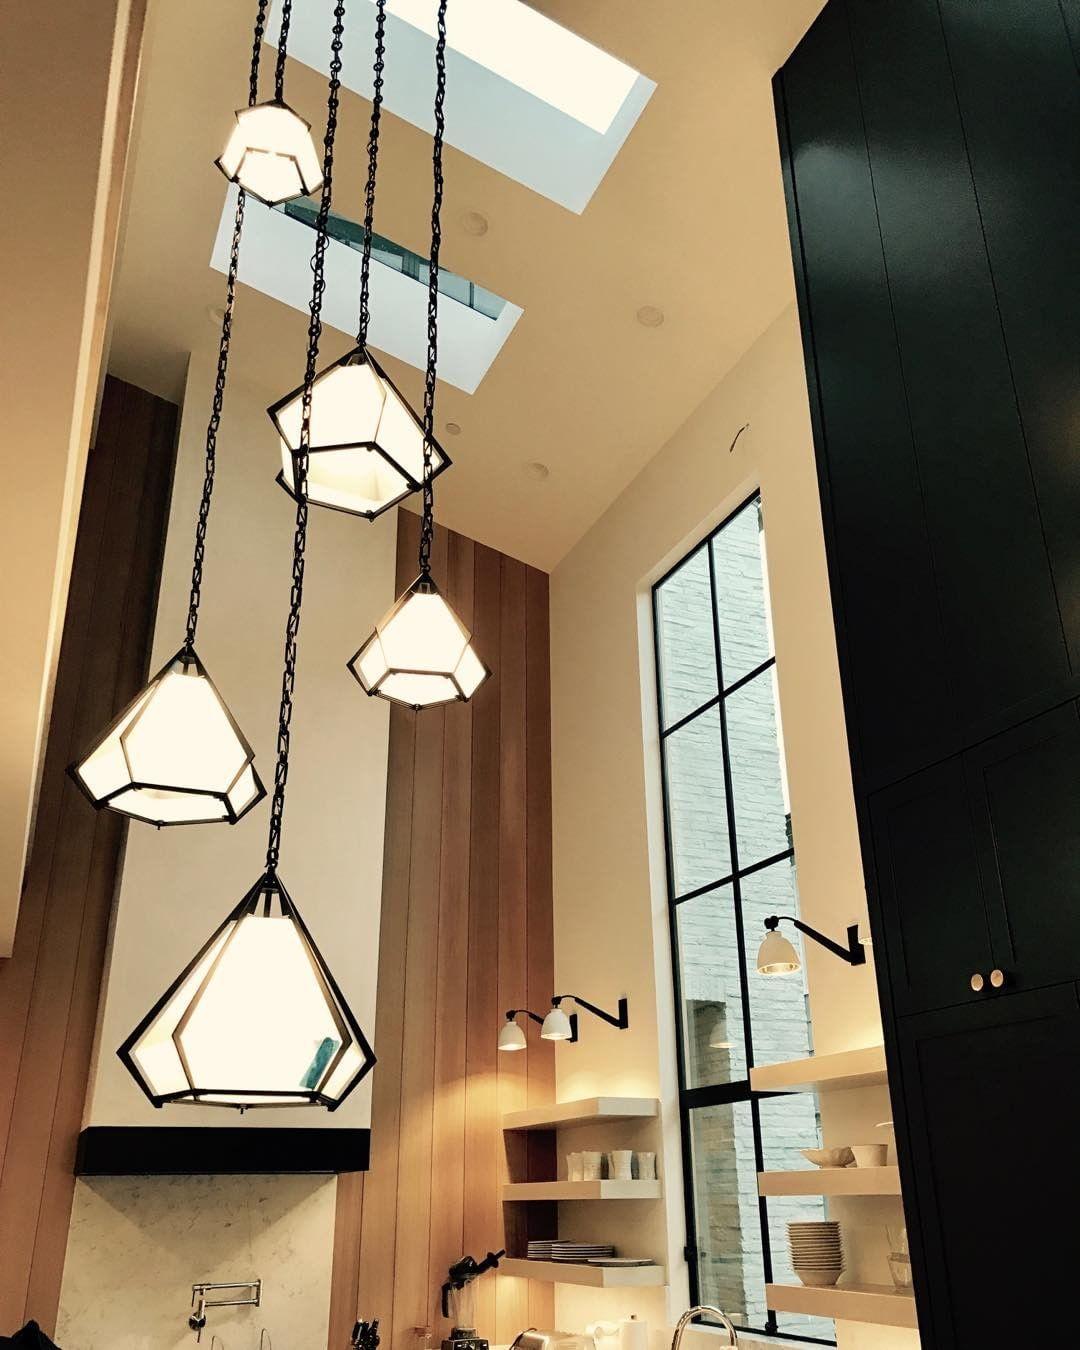 Amazing Oversize High Ceiling Lighting Feature By Ericolsendesign Kitchen Pendant Lighting Kitchen Pendants Interior Architecture Design